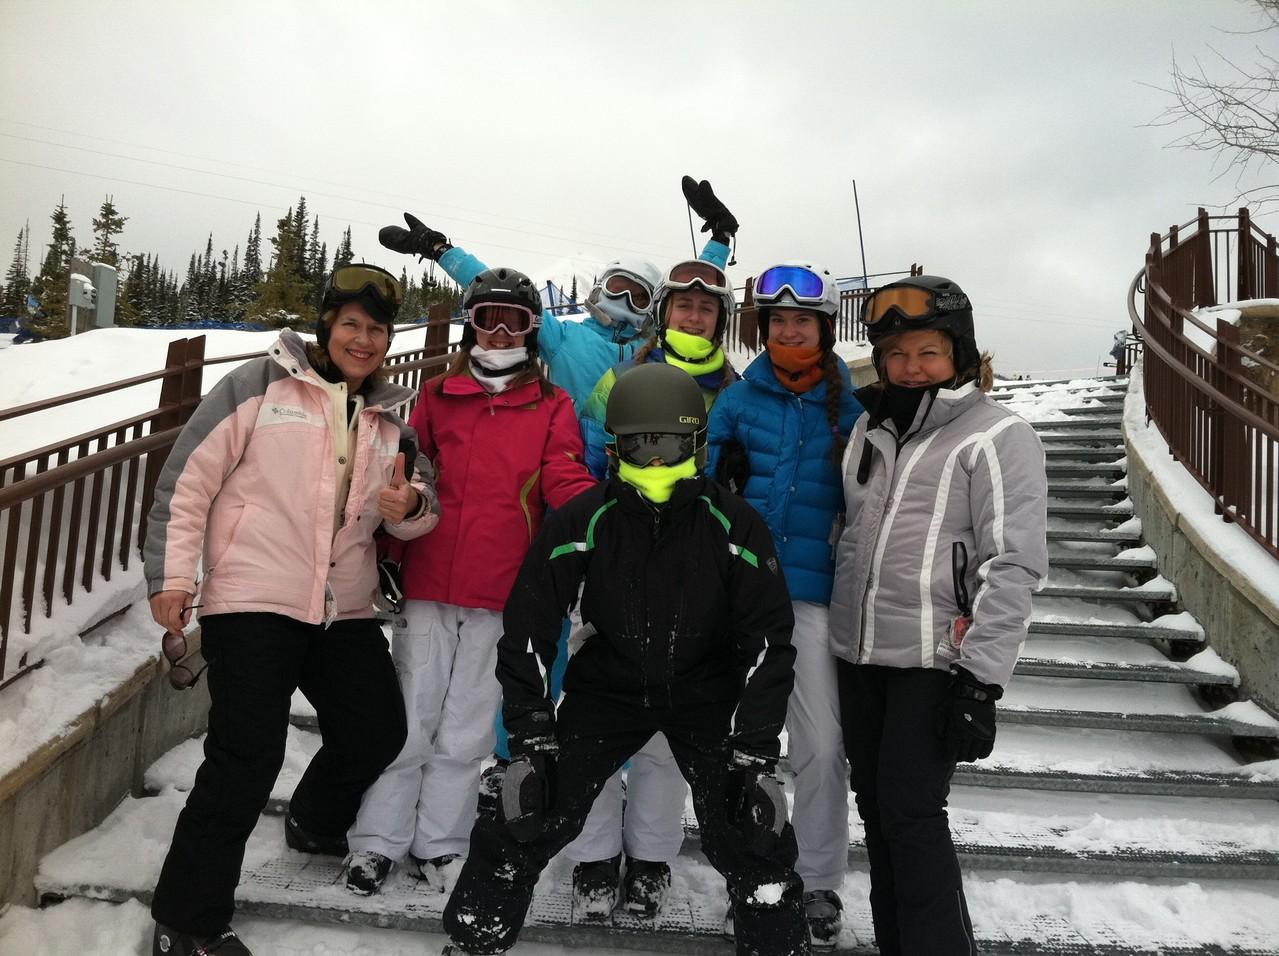 Lorraine, Gabby, Kate, Emma, Ellie, Celeste; Jack in front, Big Sky 2013